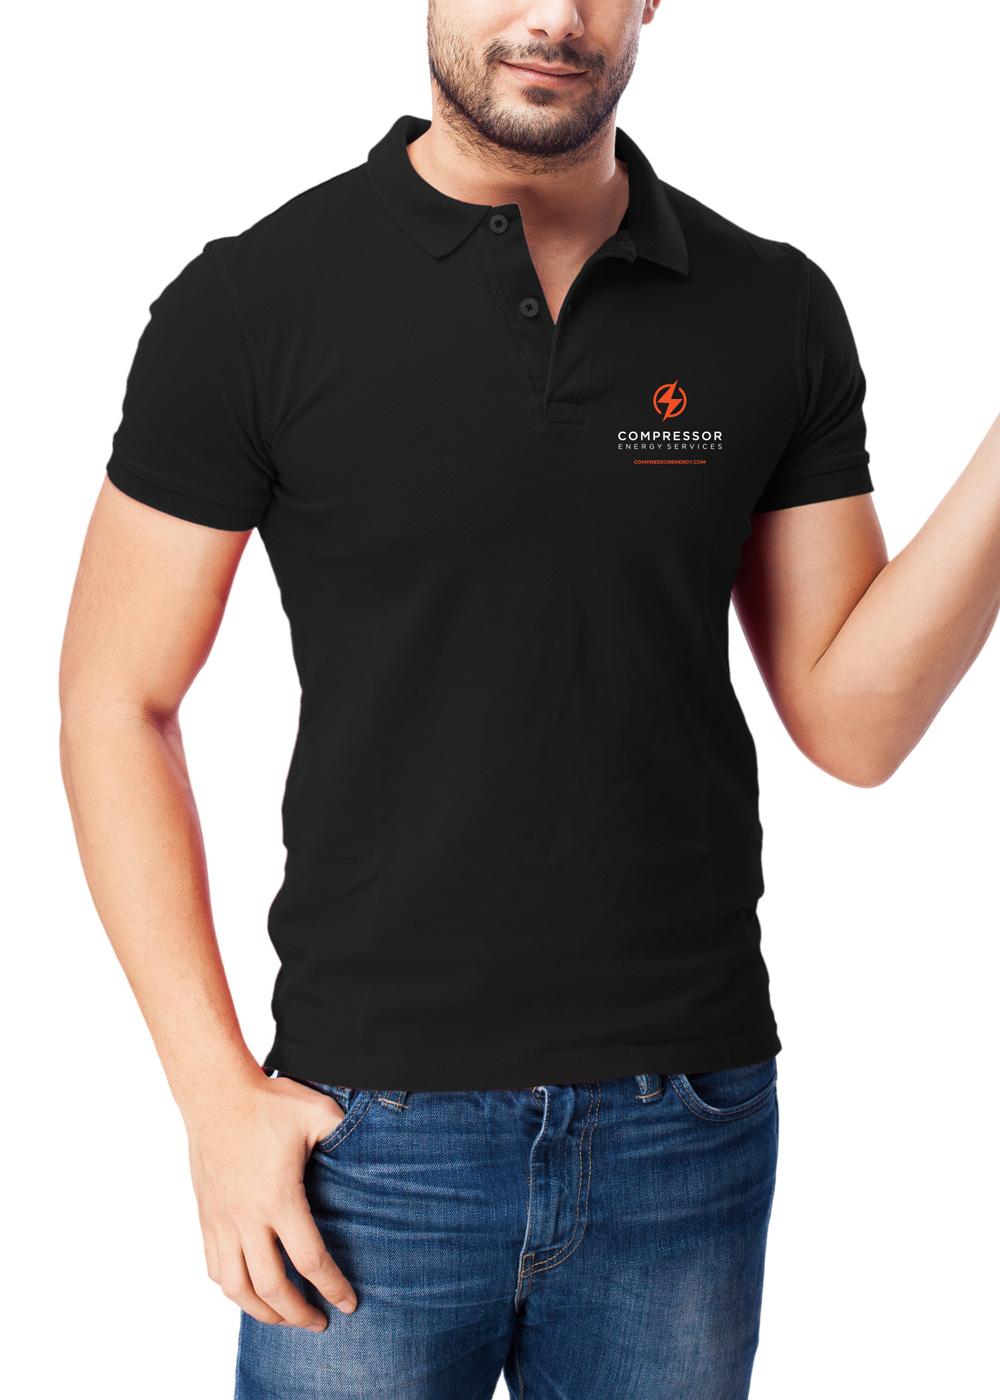 Energy company apparel